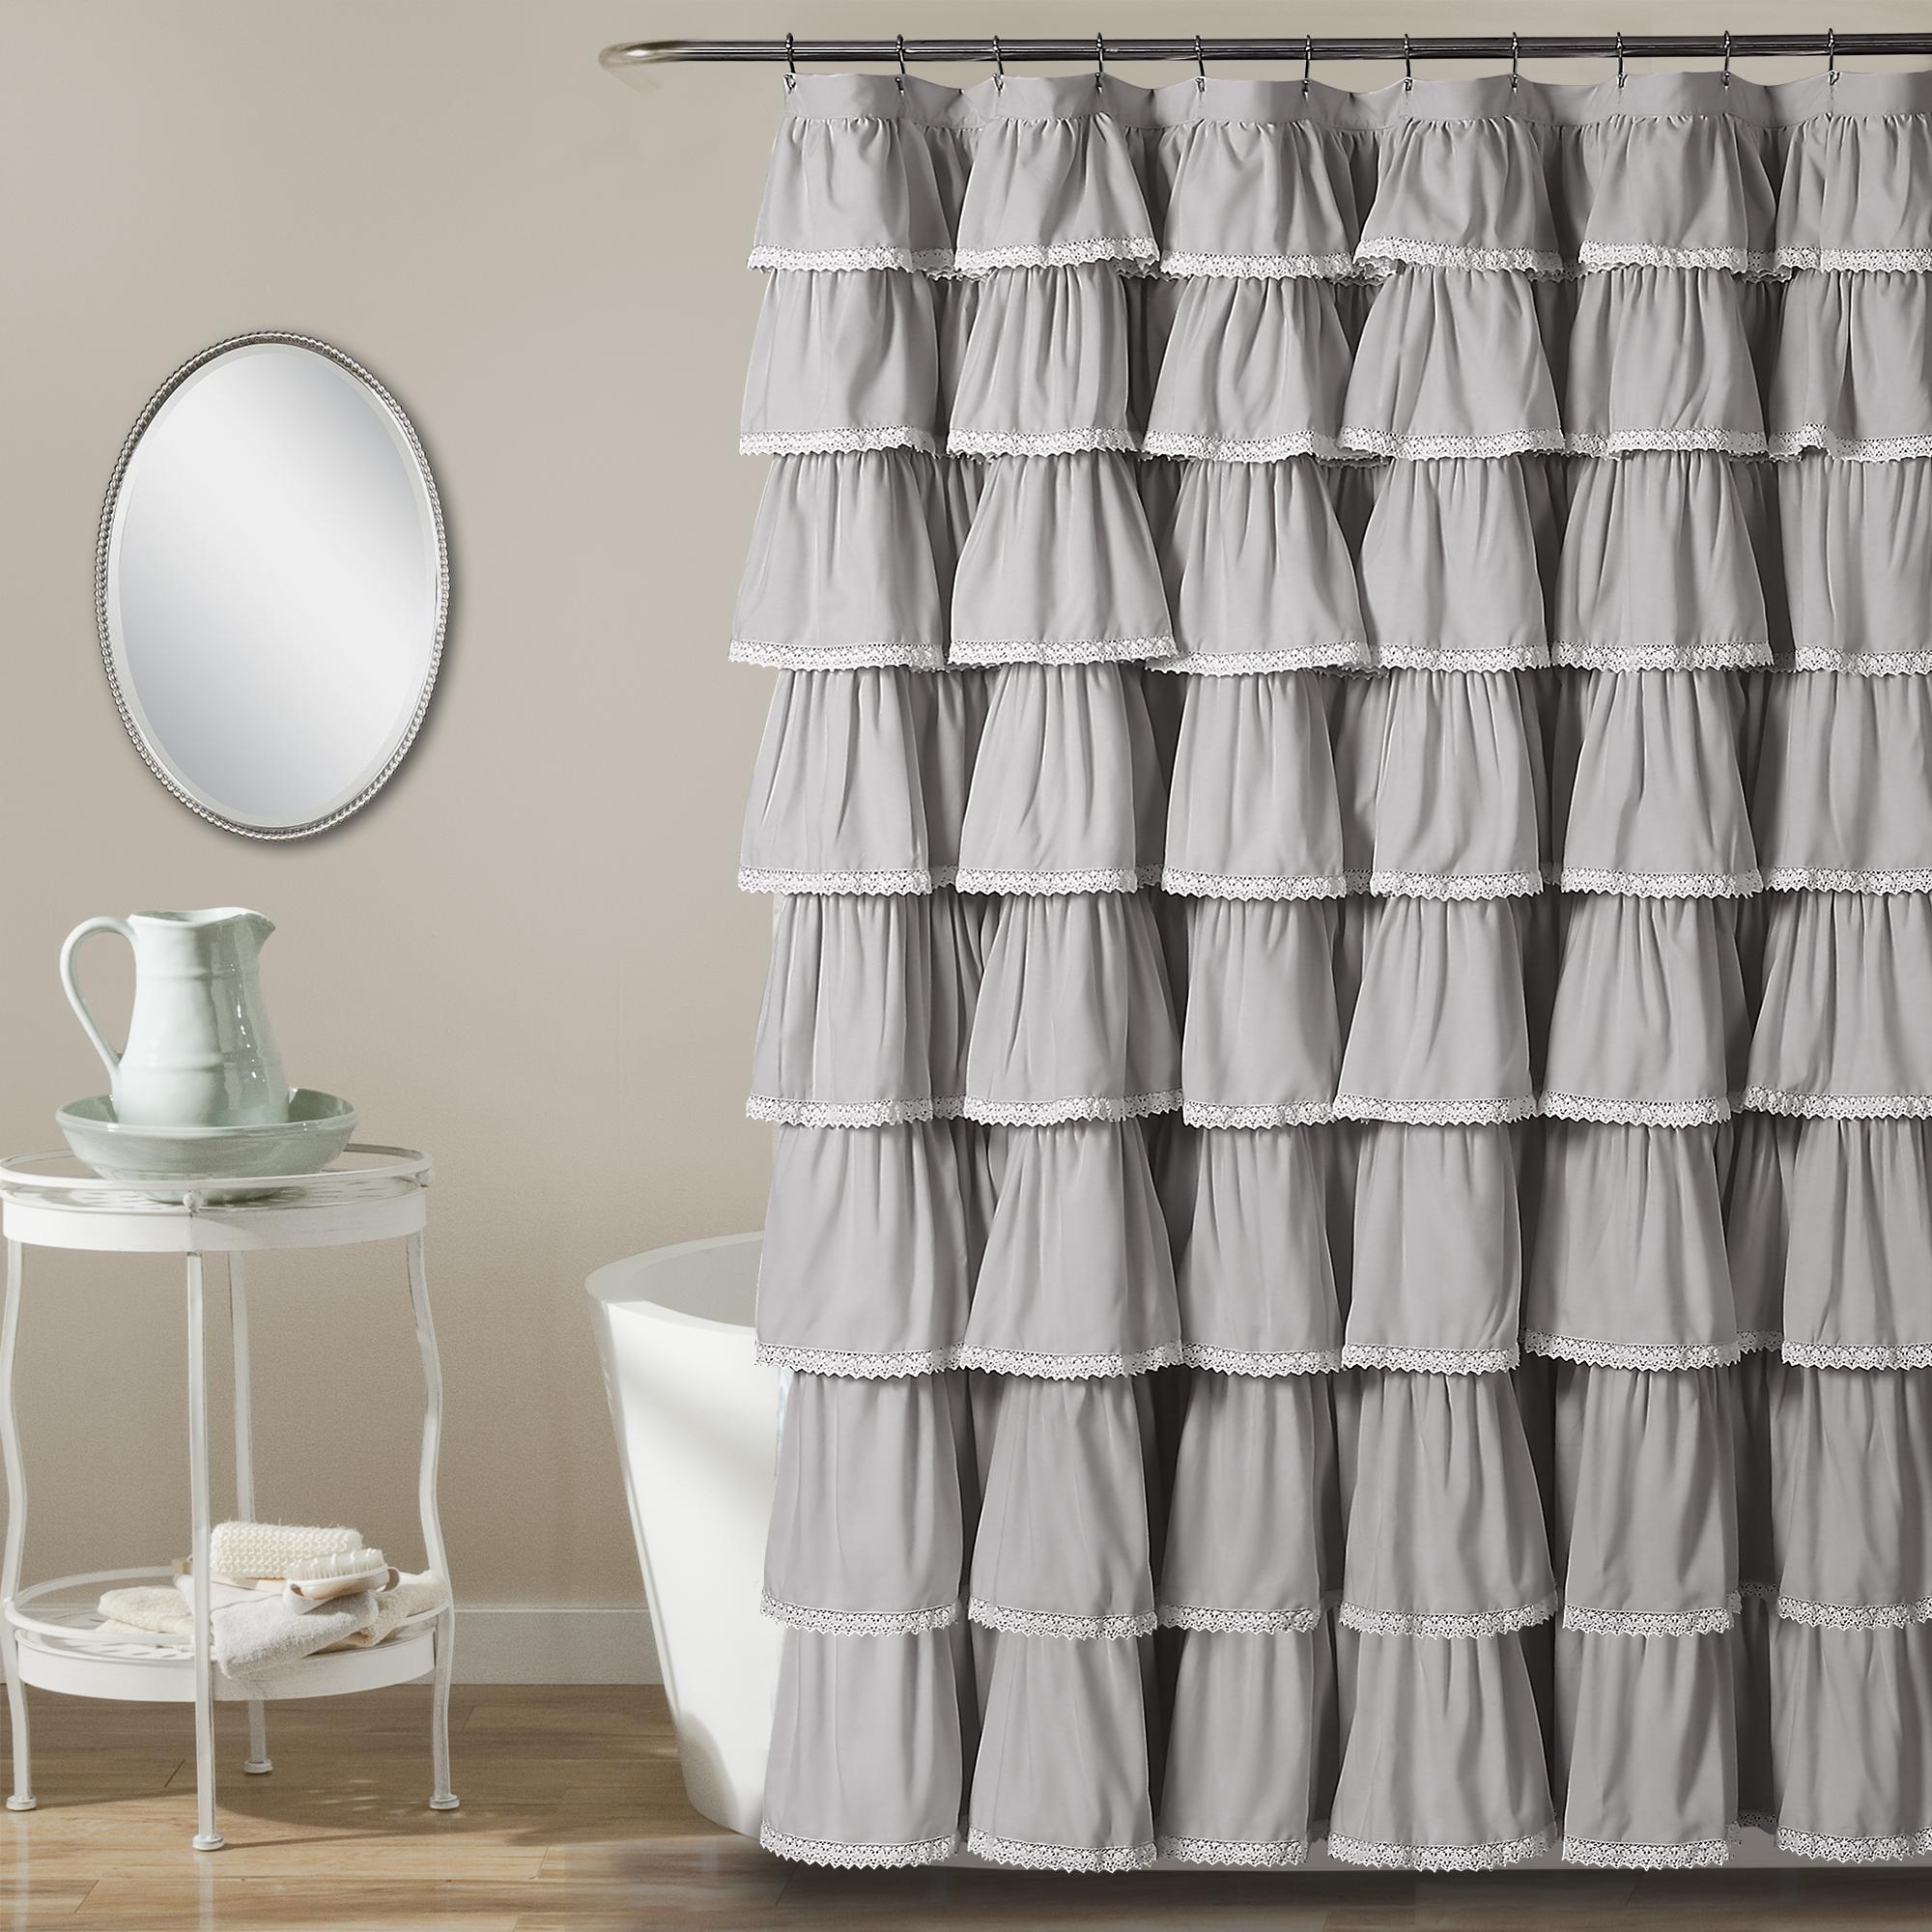 Ruffle Flower Shower Curtain White 72x72